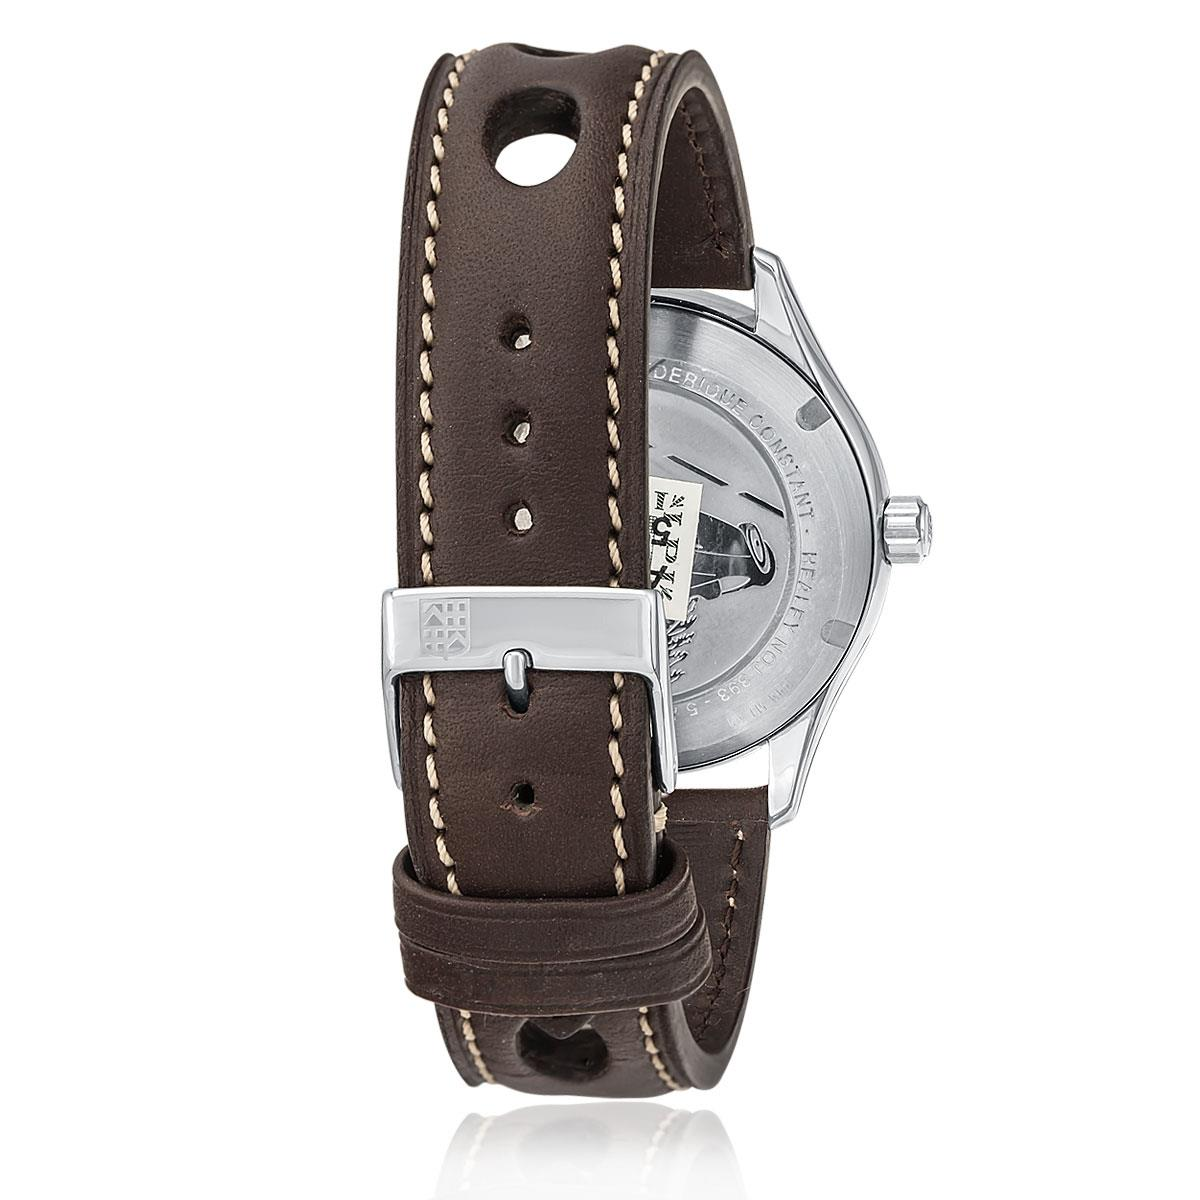 a40b841fd64 Relógio Masculino Frederique Constant Vintage Healey Automatic Analógico  WF20013S Marrom